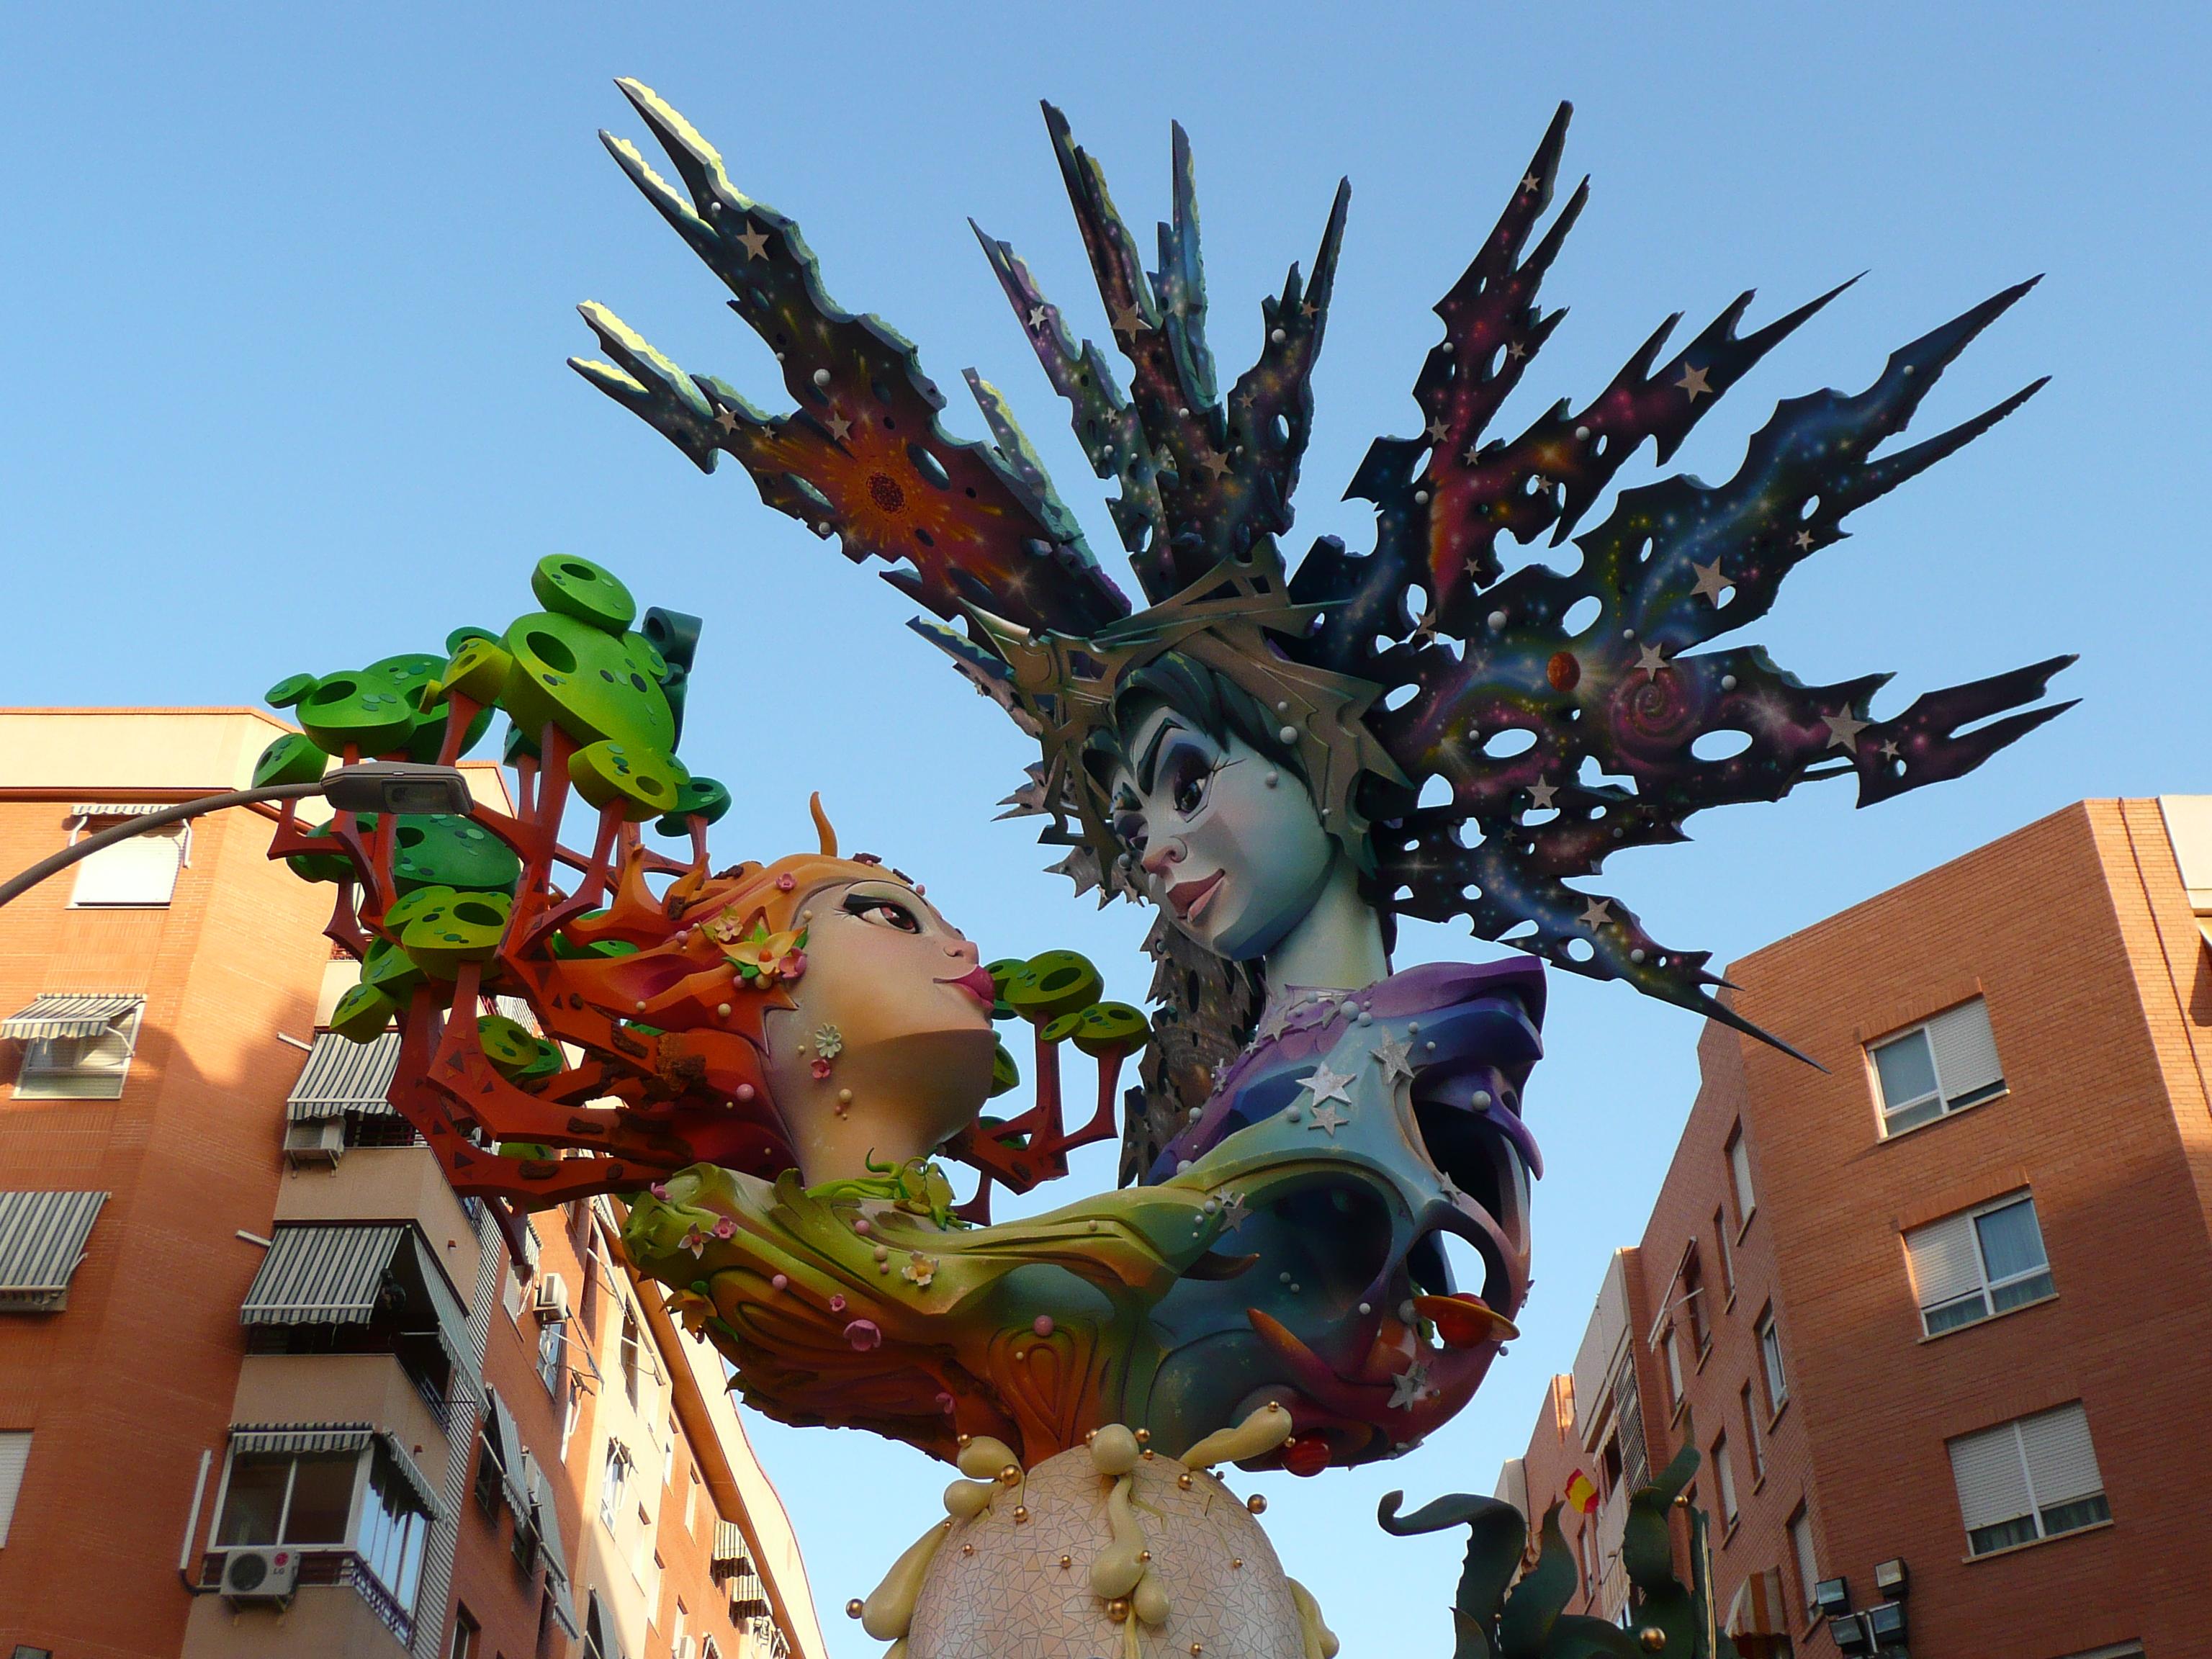 1c47000d2 Hogueras de Alicante - Wikipedia, la enciclopedia libre